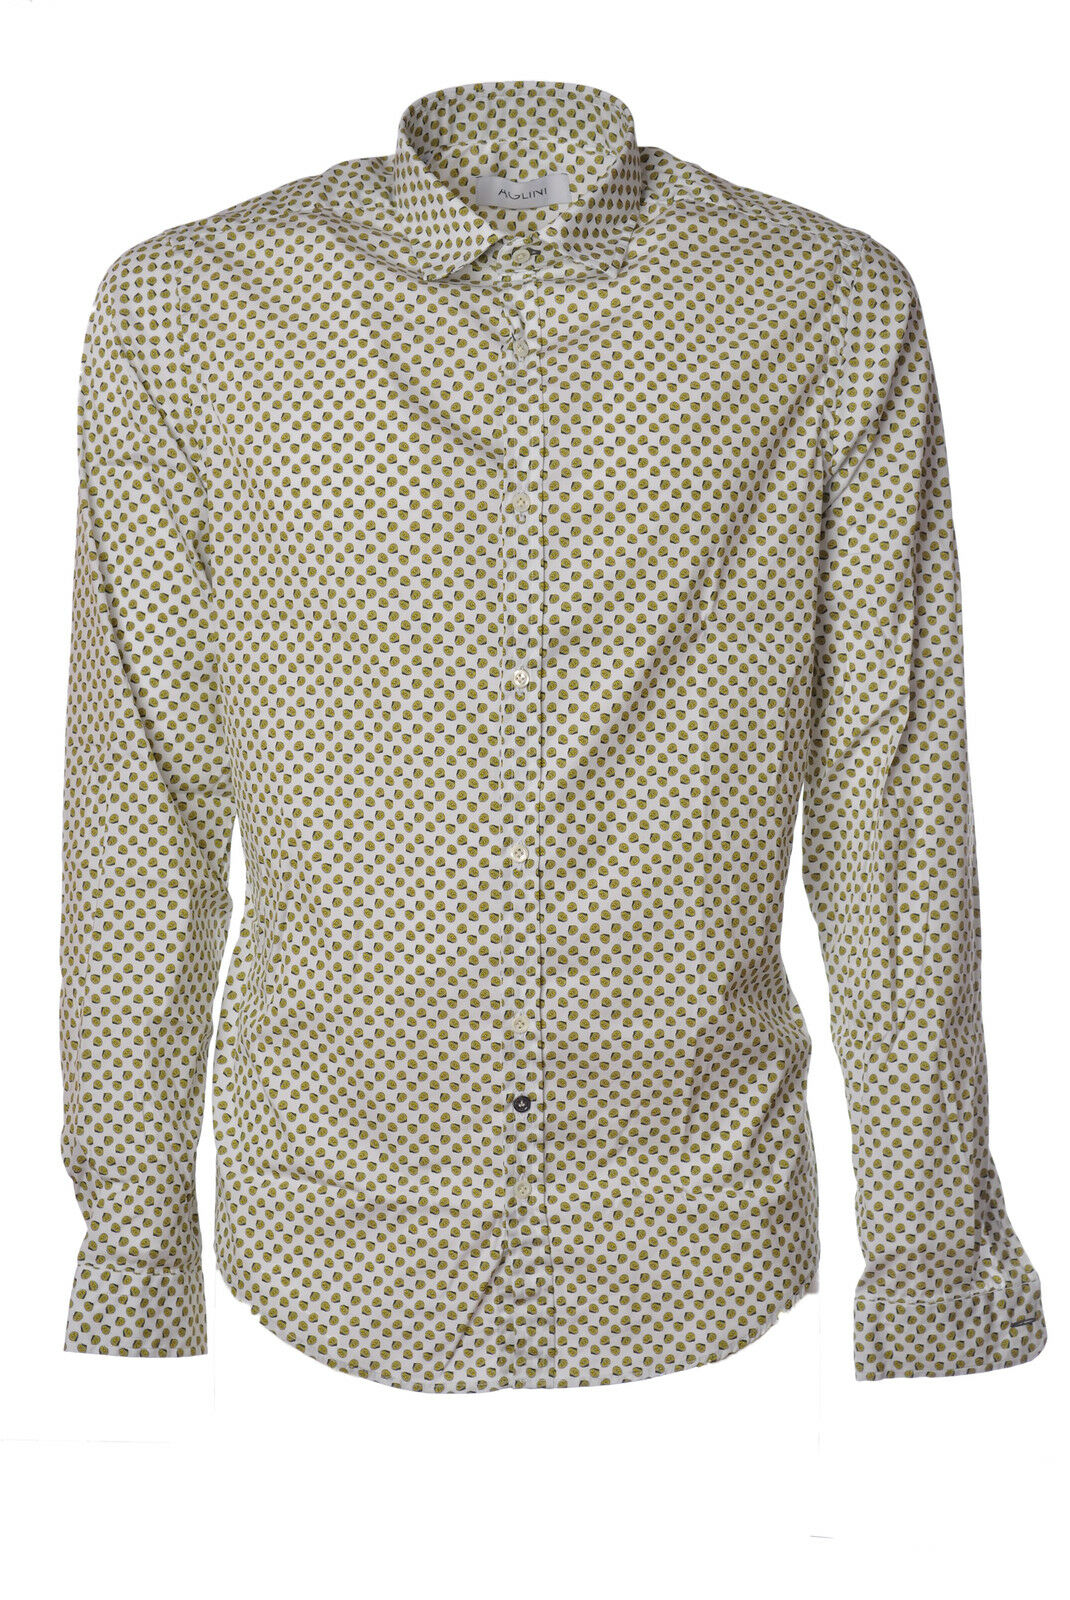 Aglini  -  Shirt - Male - 41 - White - 1235804B161629